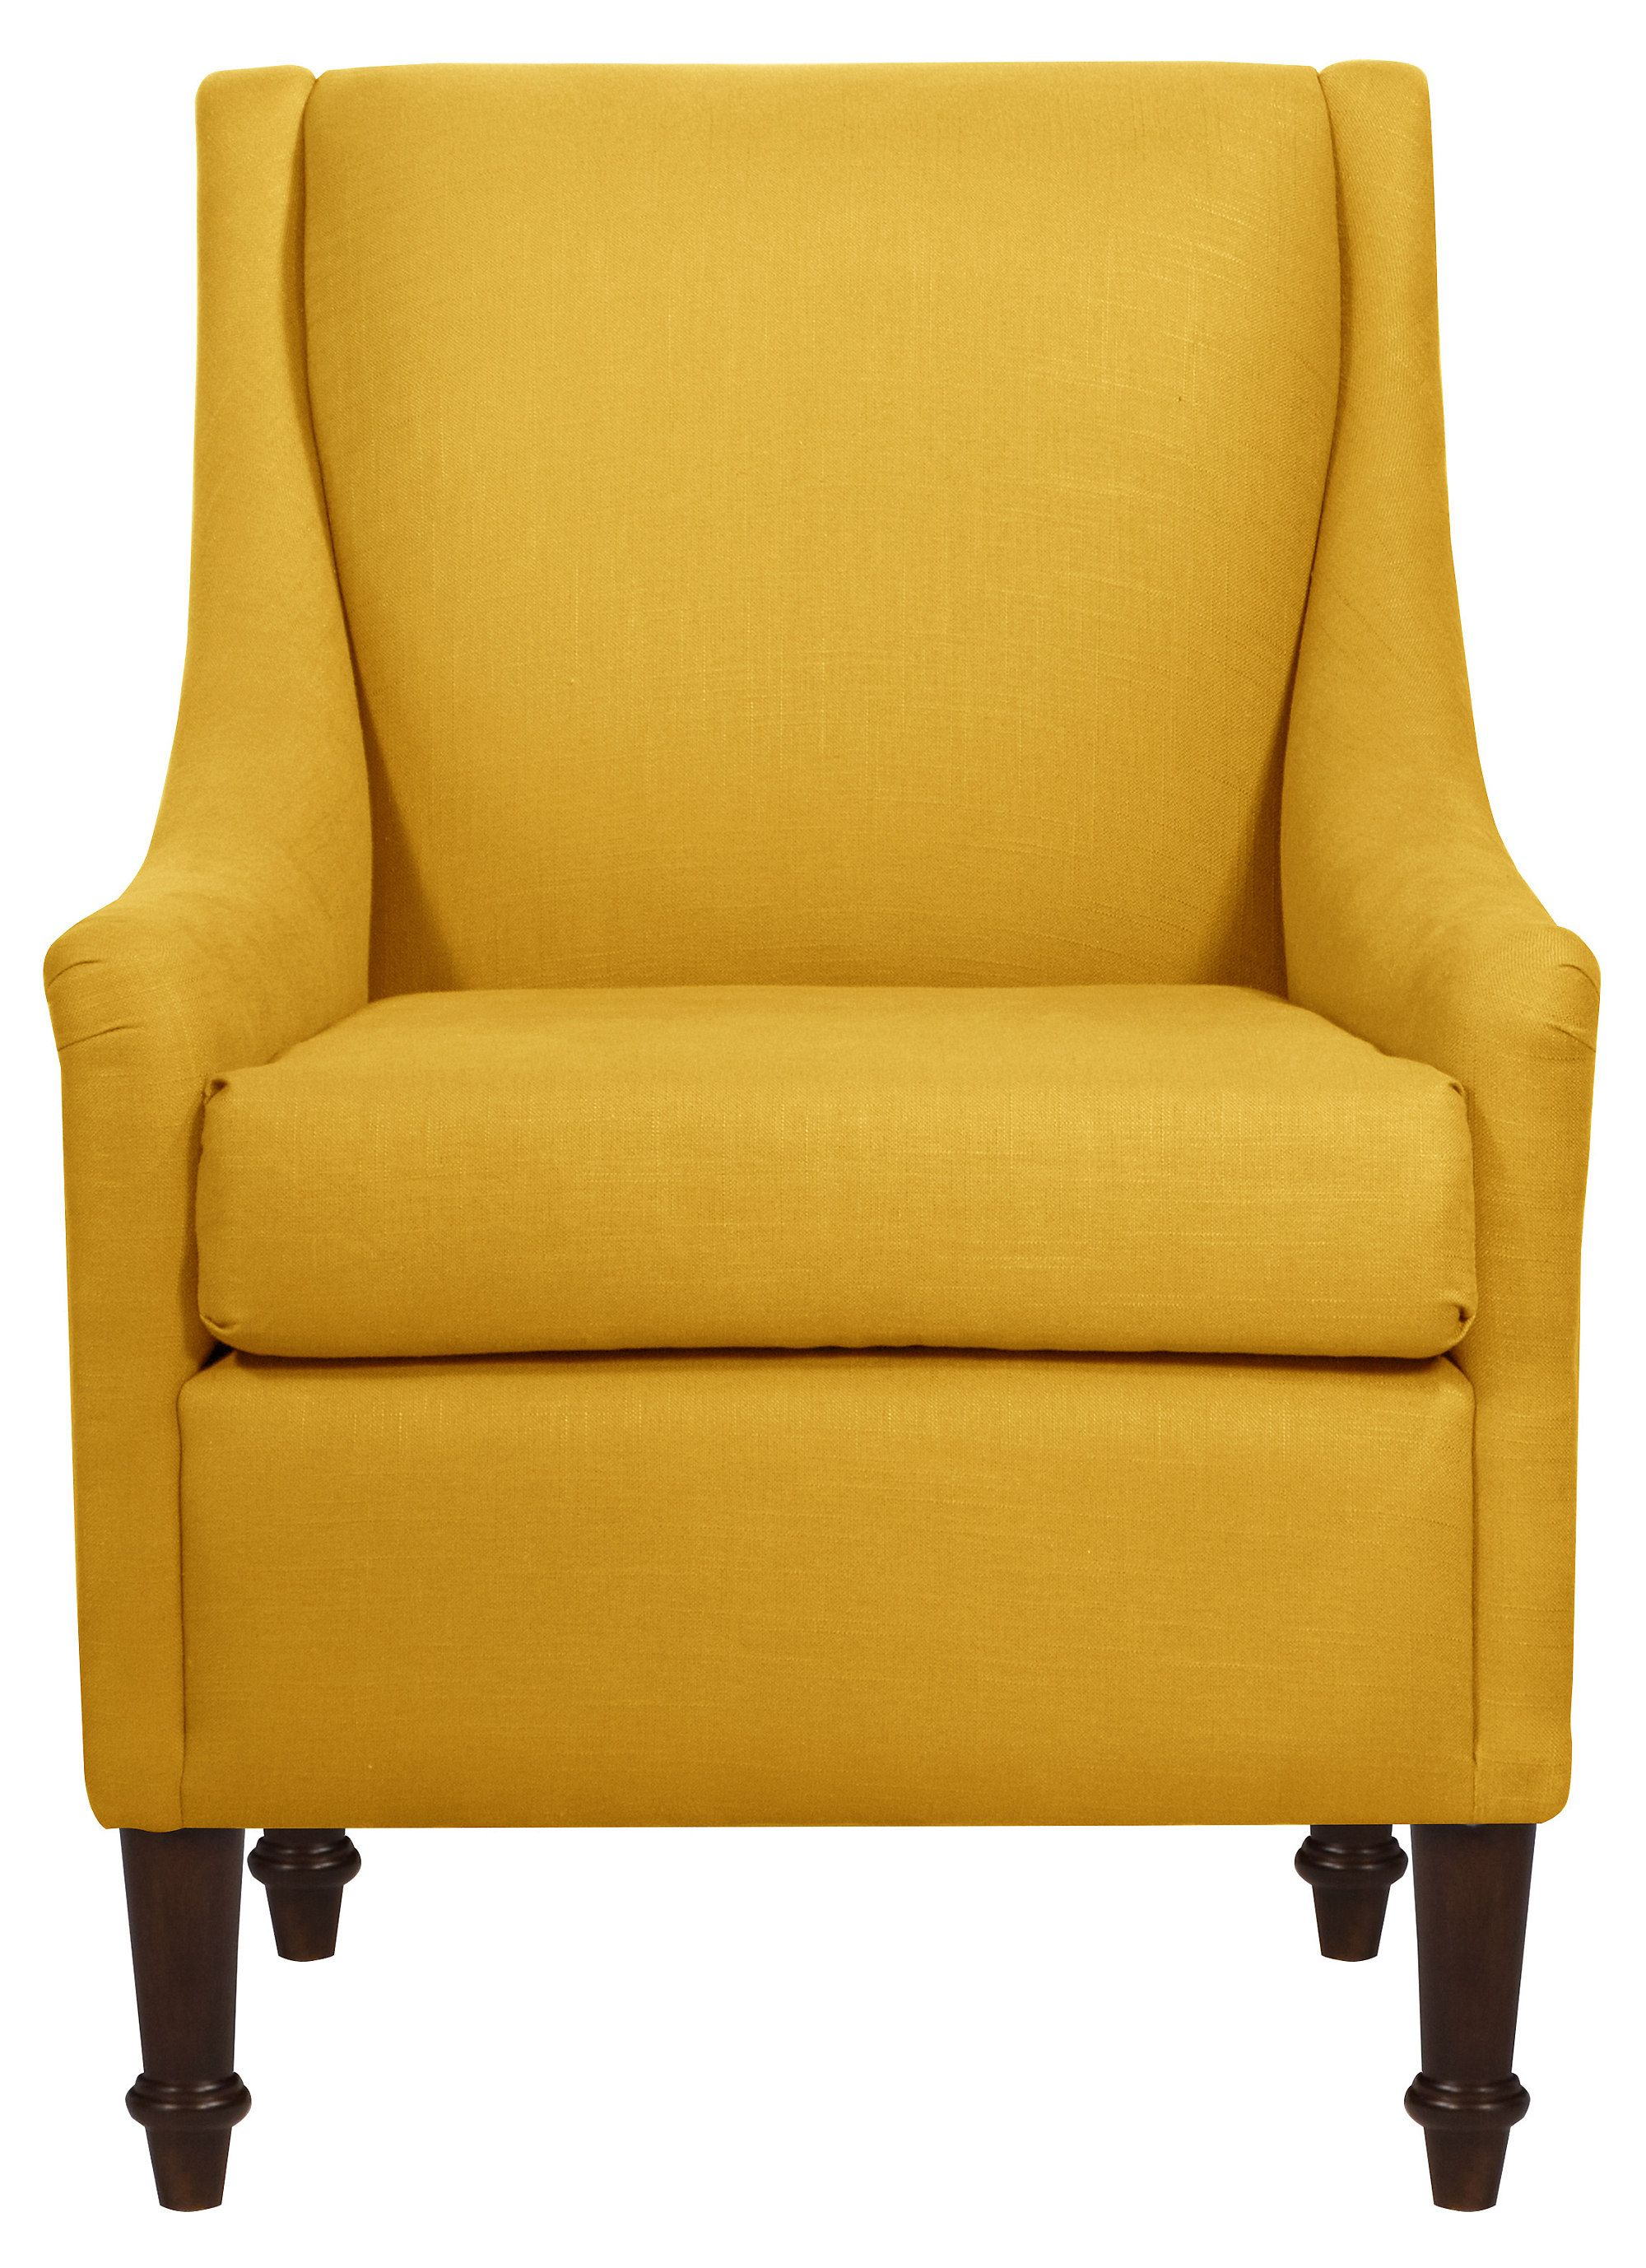 Beau Holmes Chair, French Yellow Linen | One Kings Lane